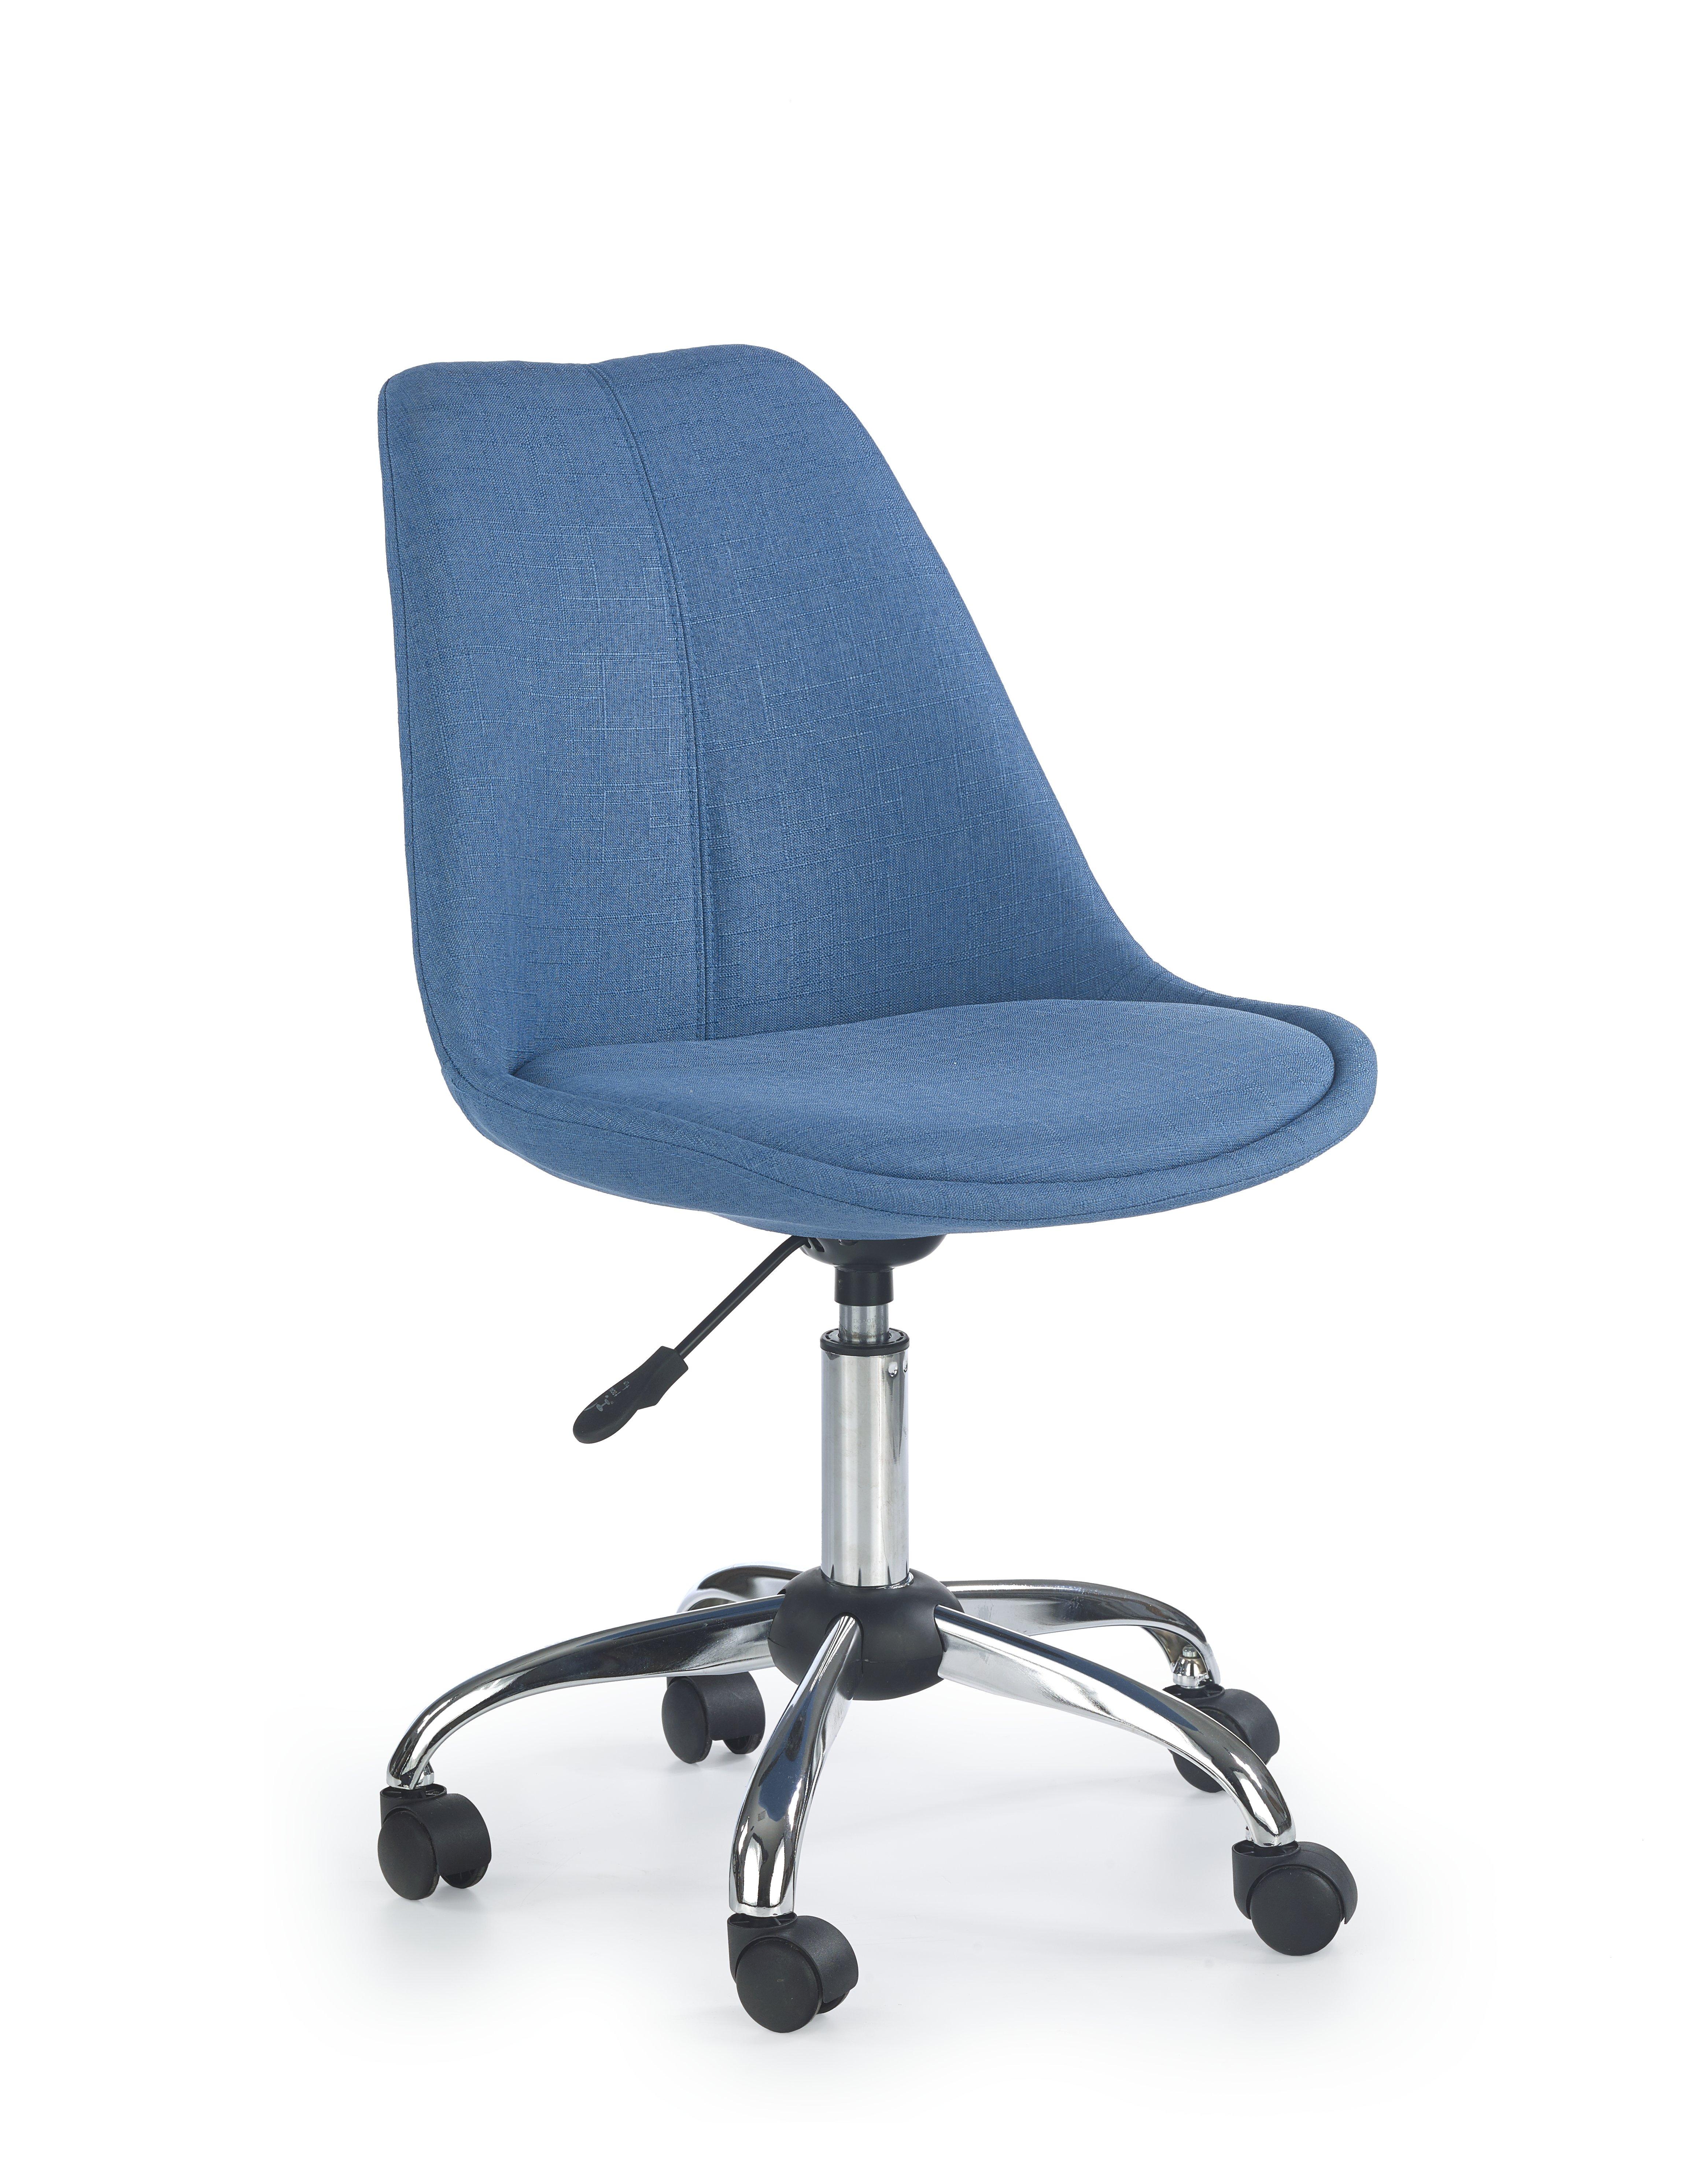 Dětská židle - Halmar - Coco 4 (modrá)